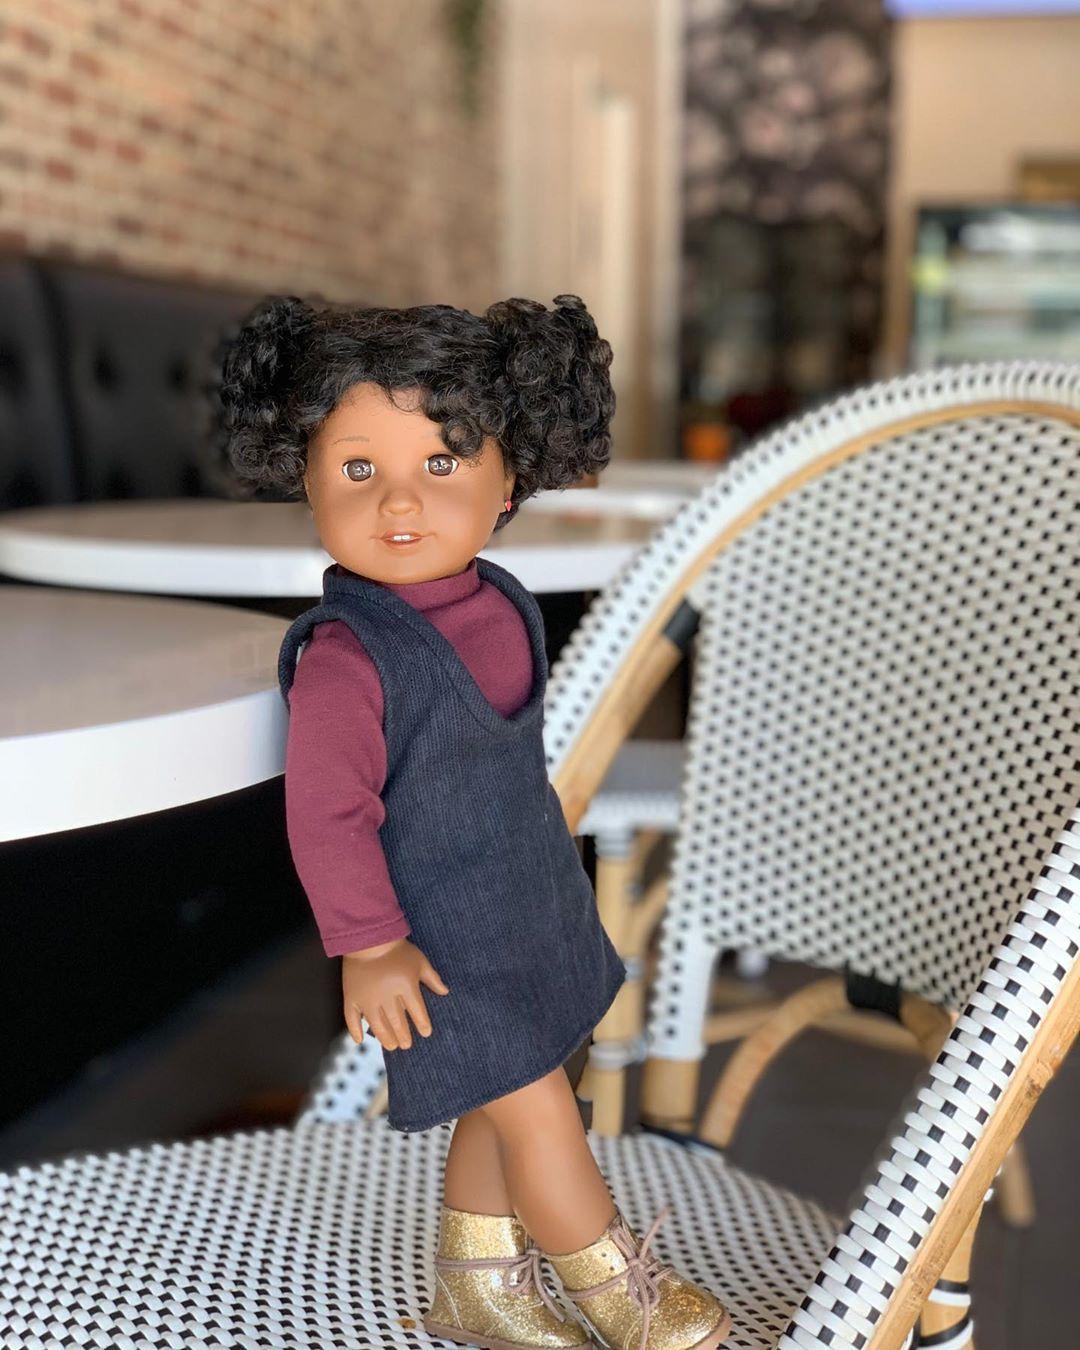 Yuki Mitten On Instagram Ooh La La Cafe Time With Crystal Americangirldoll Agig Cyoagdoll Createyourown American Girl Doll Doll Photography Girl Dolls